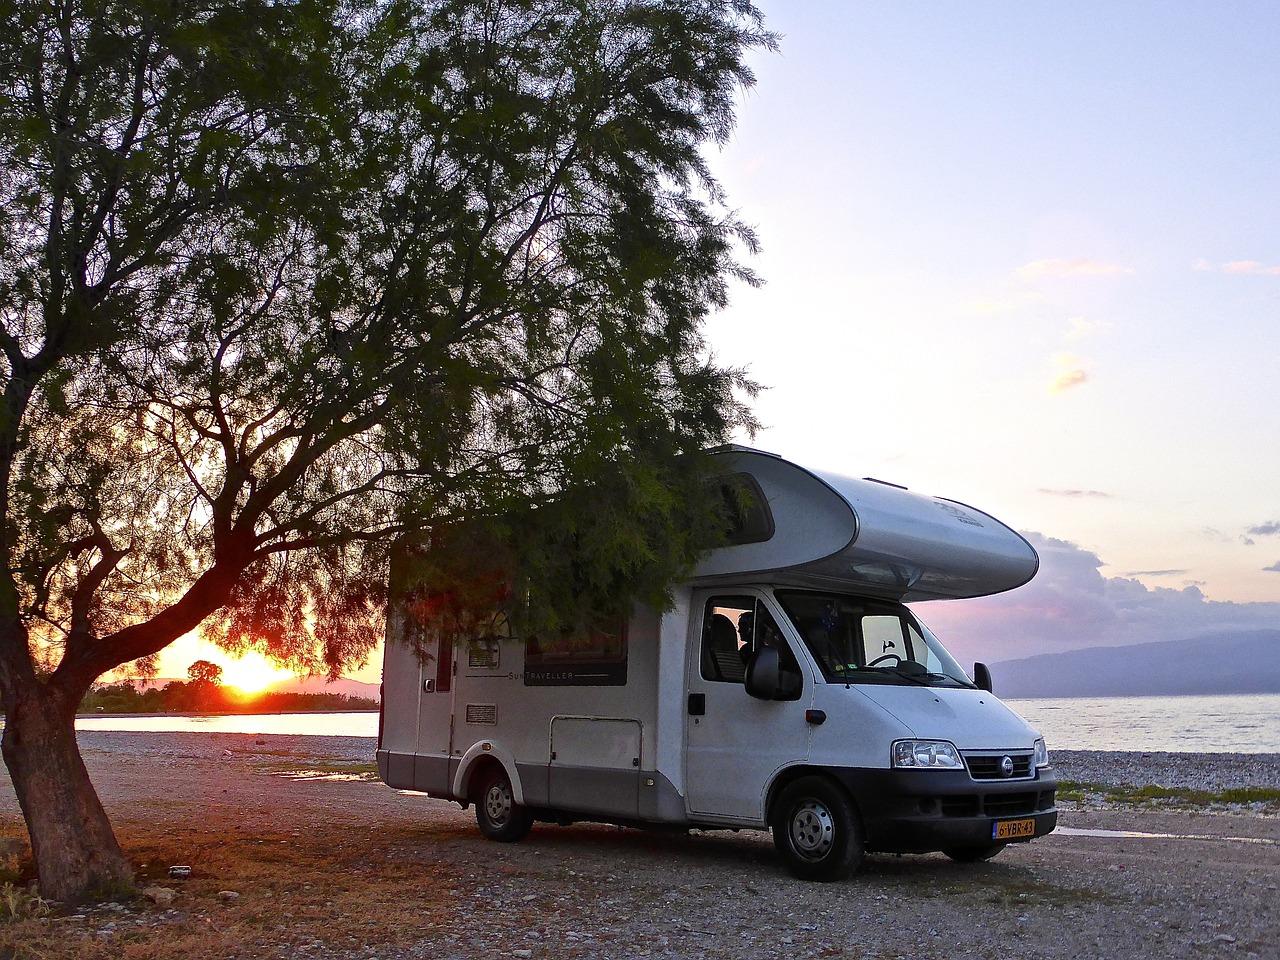 A large campervan parked on a rocky shoreline at sunset